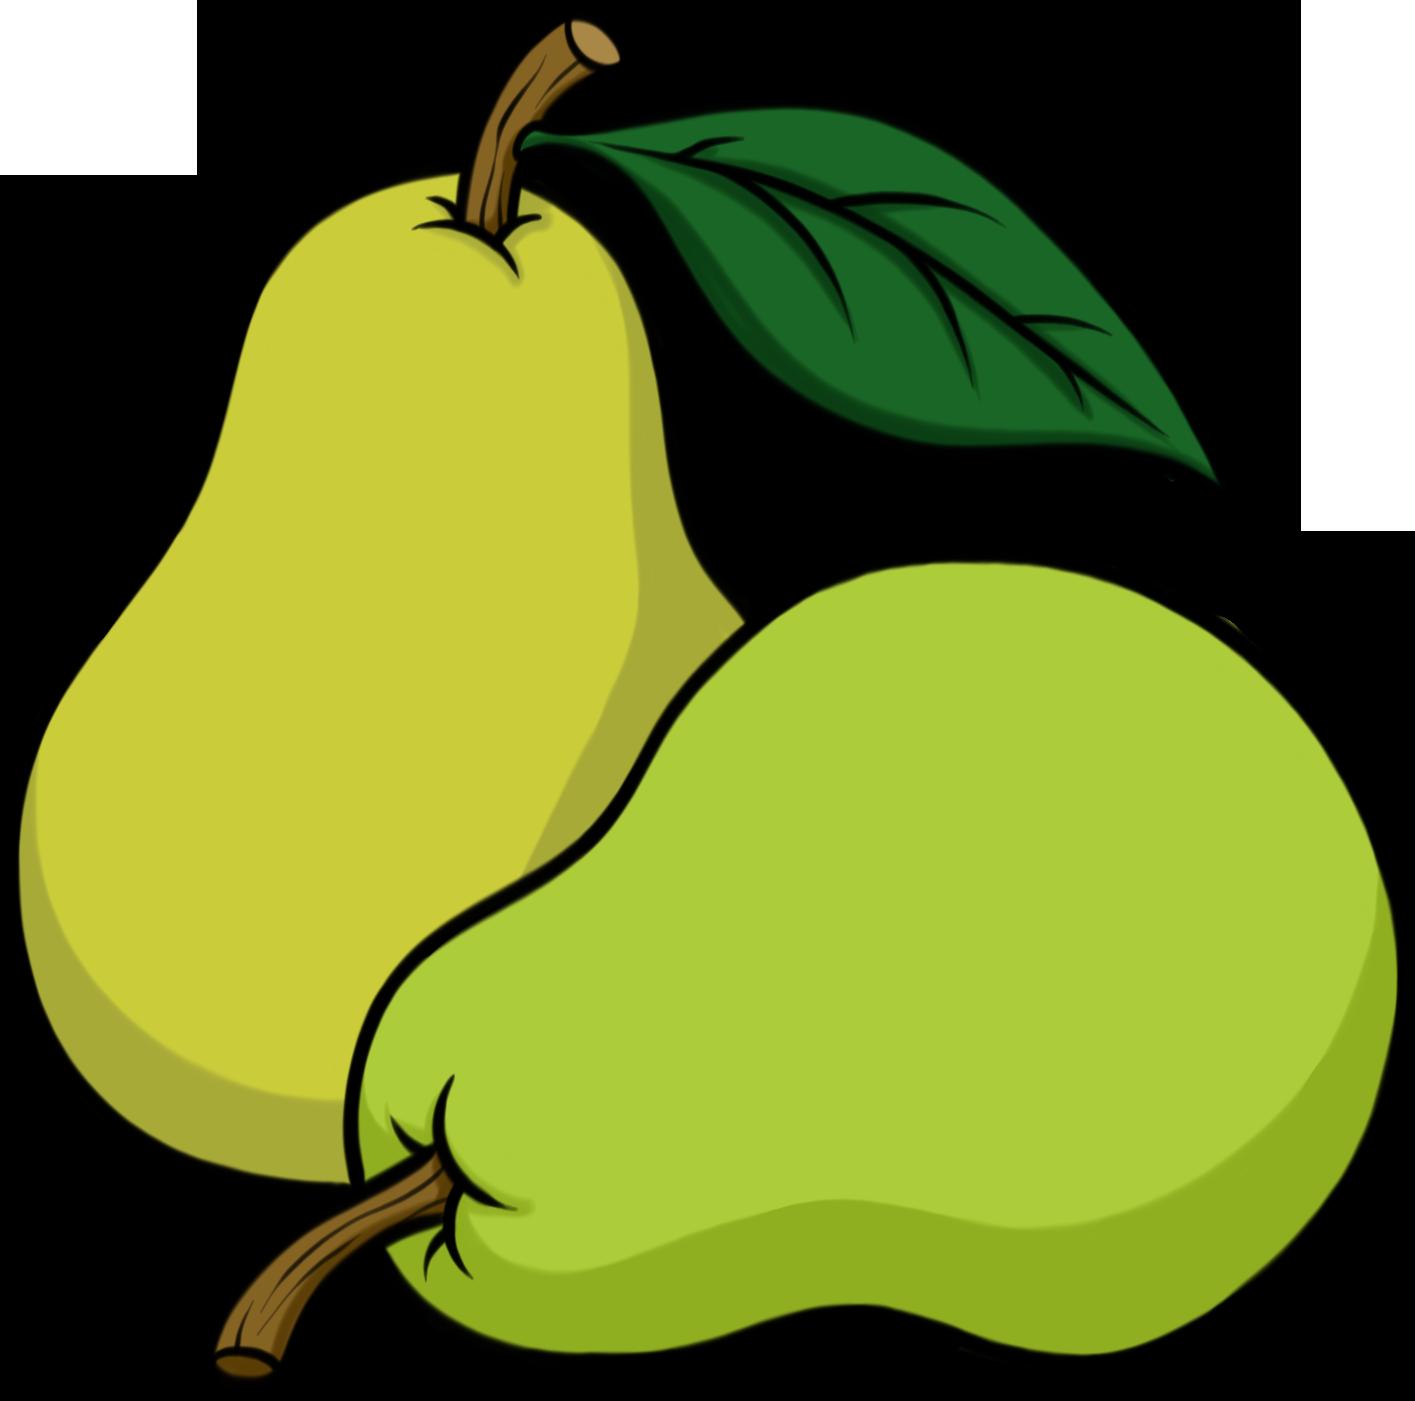 Pears Drawing at GetDrawings